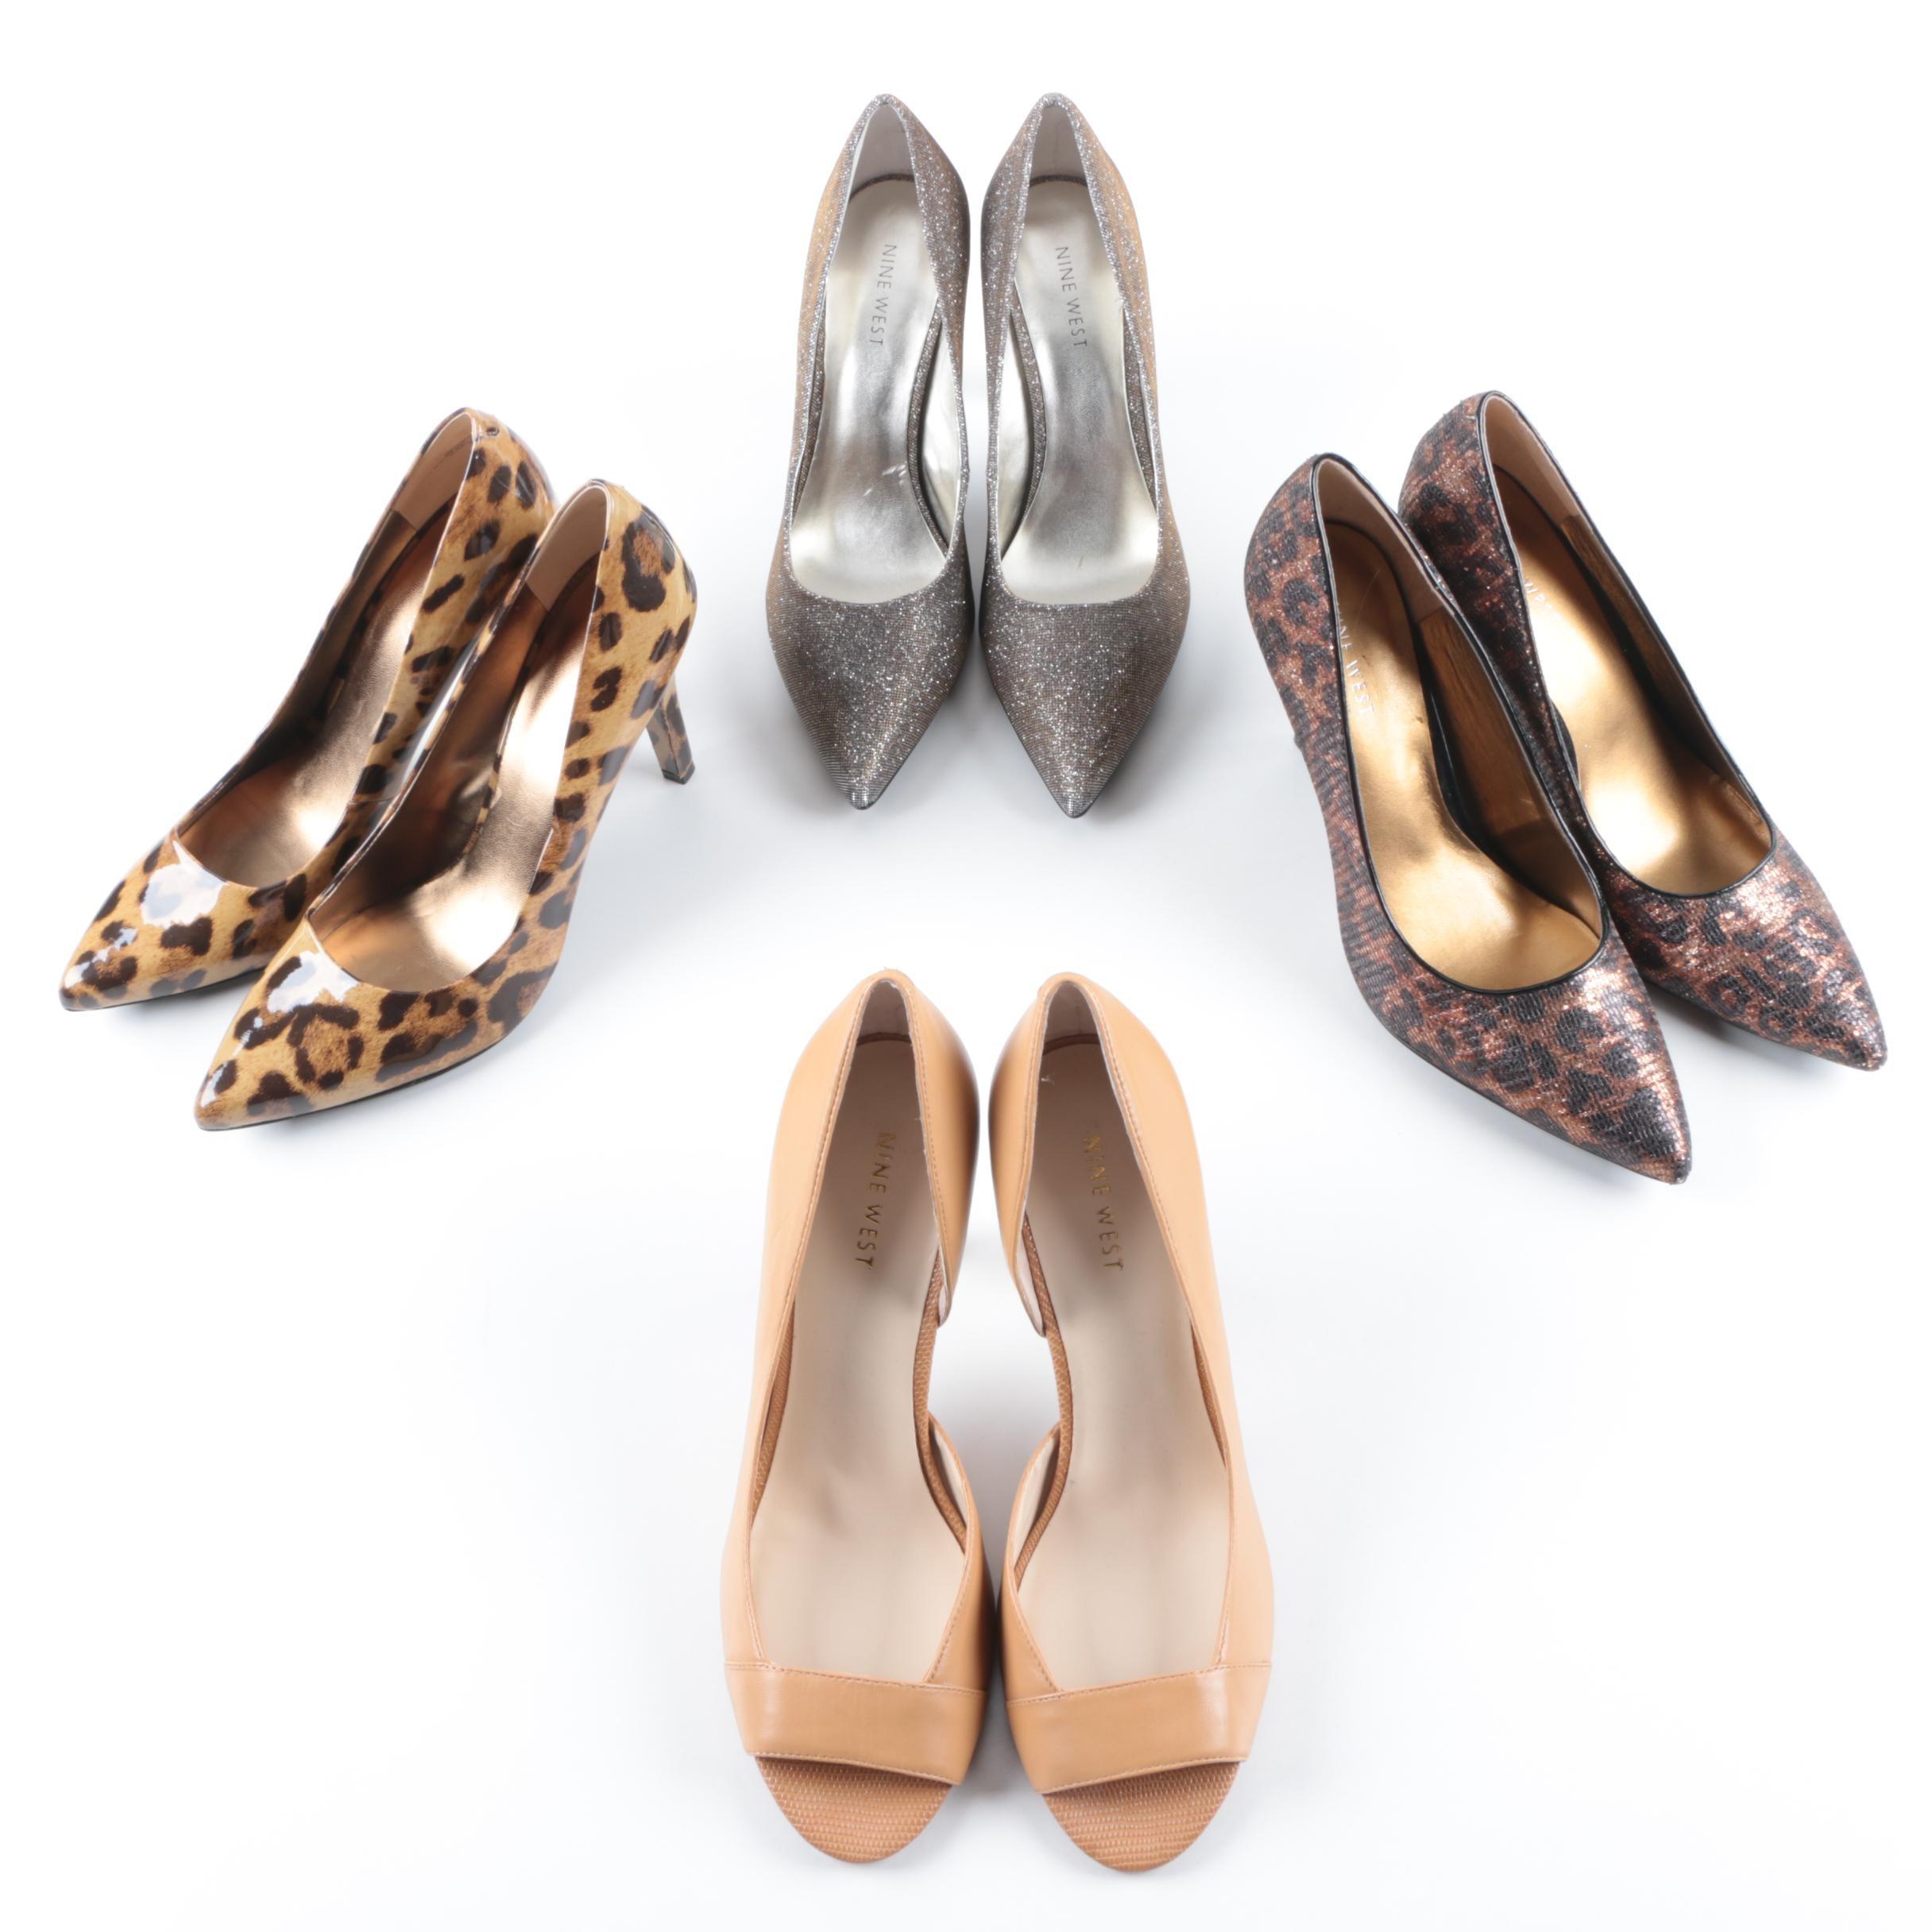 Women's Nine West High Heeled Shoes